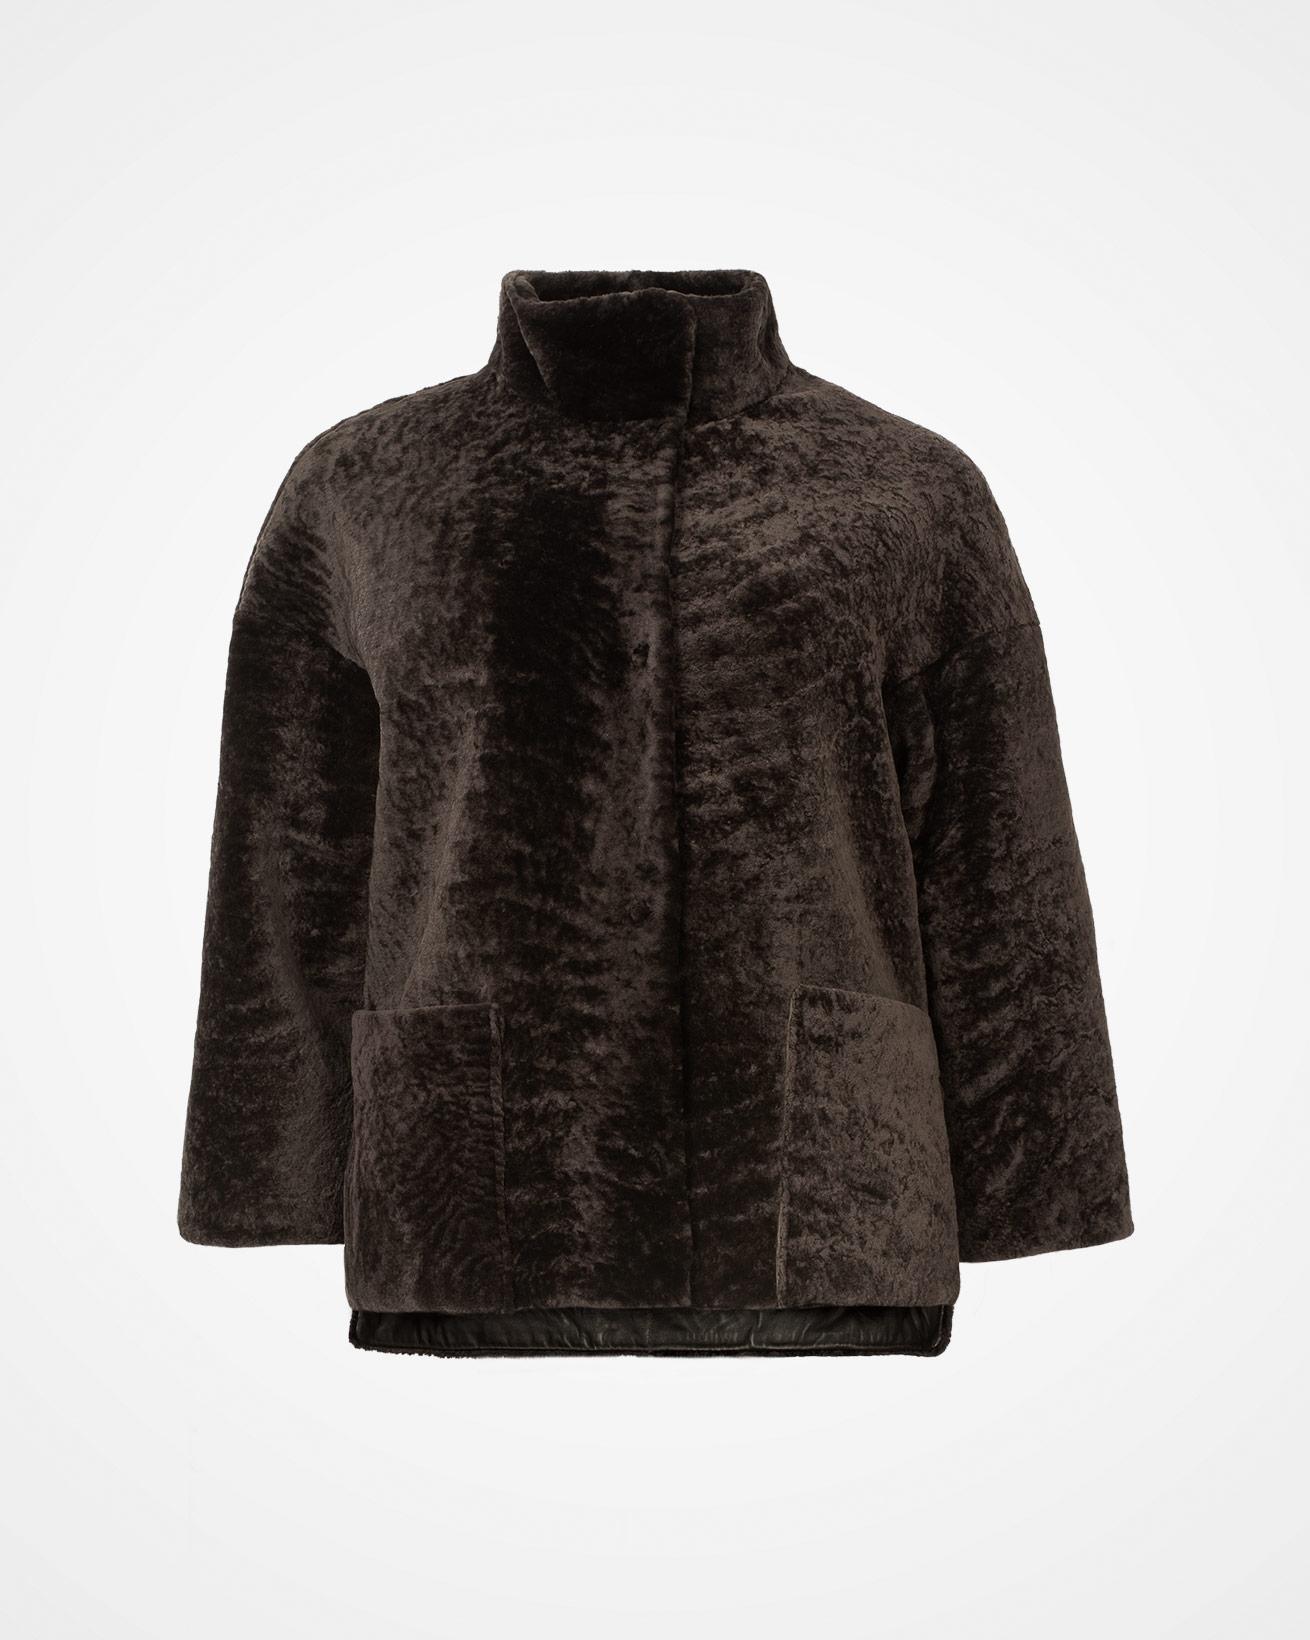 7626_opera-cape-coat_mole_front.jpg